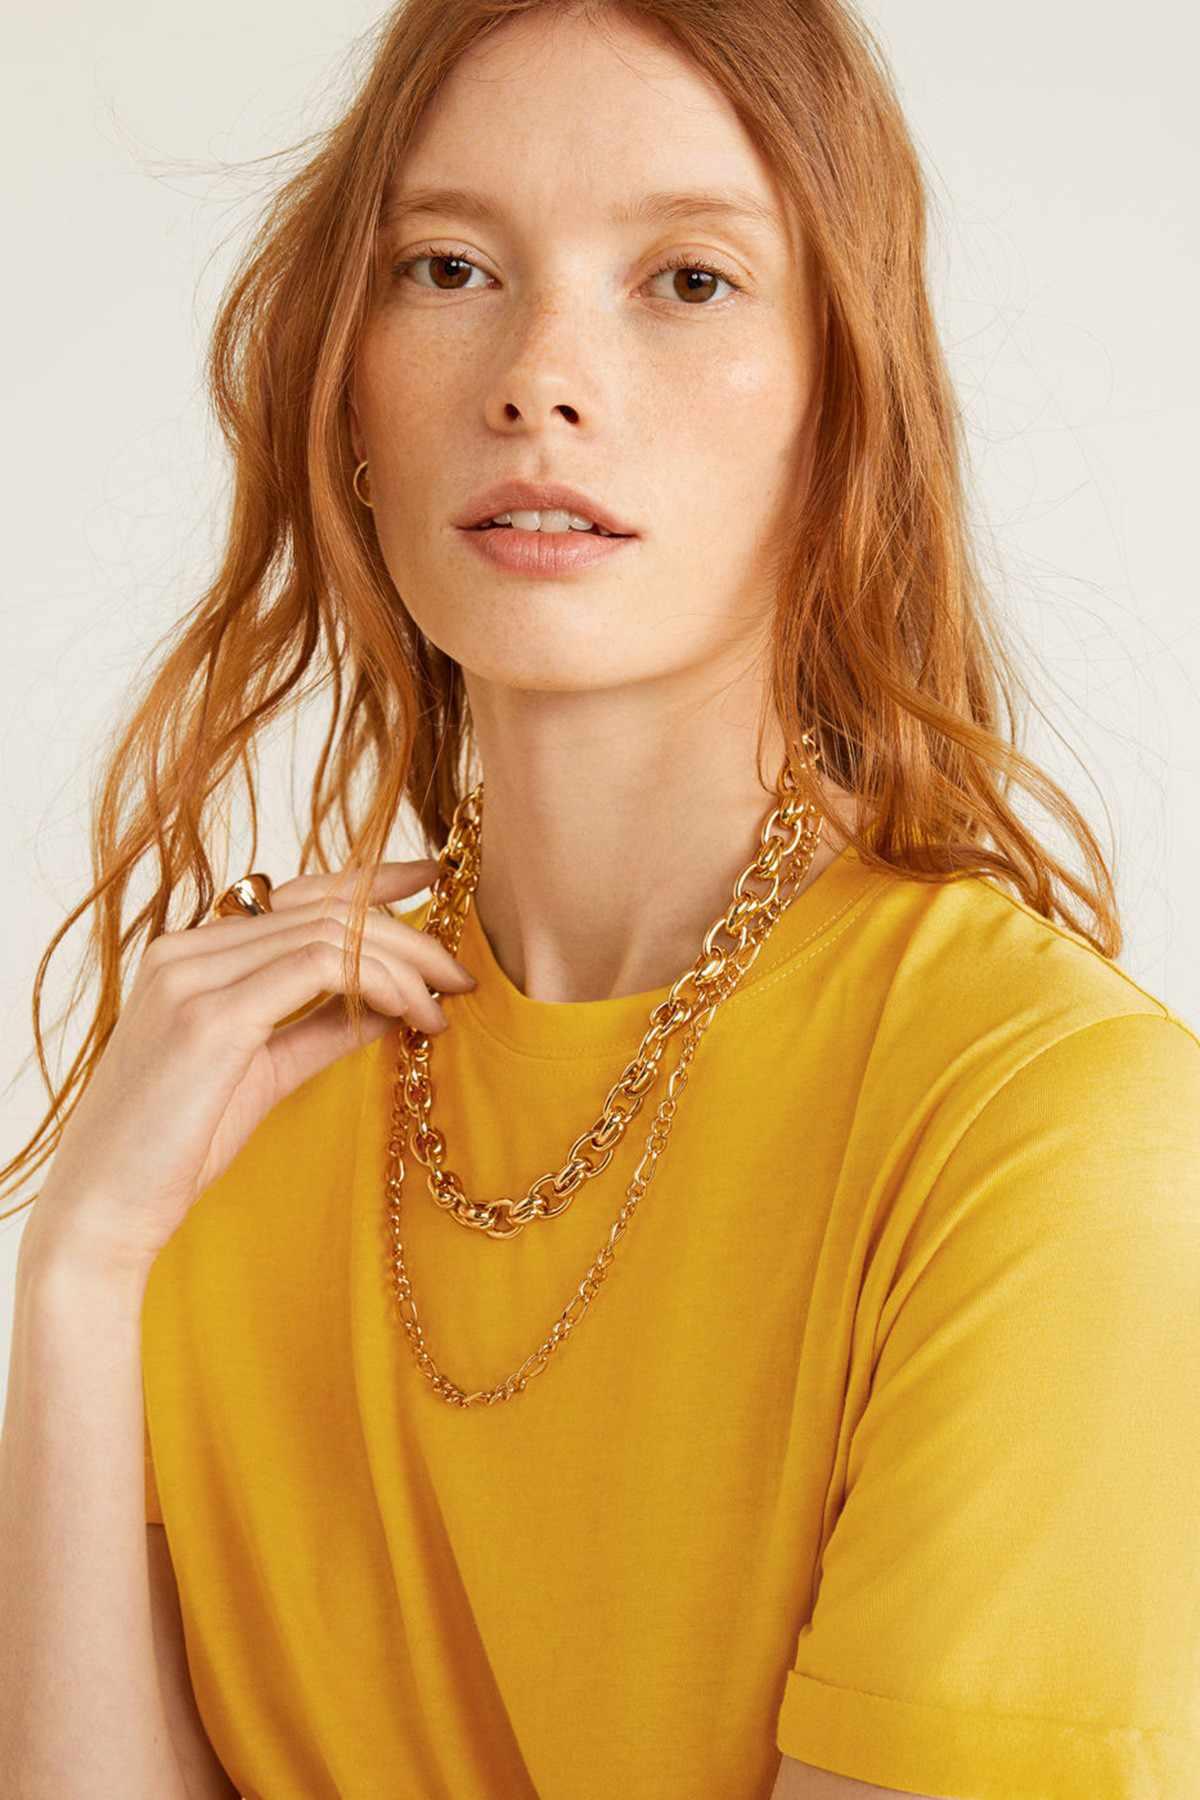 Women in mustard yellow top